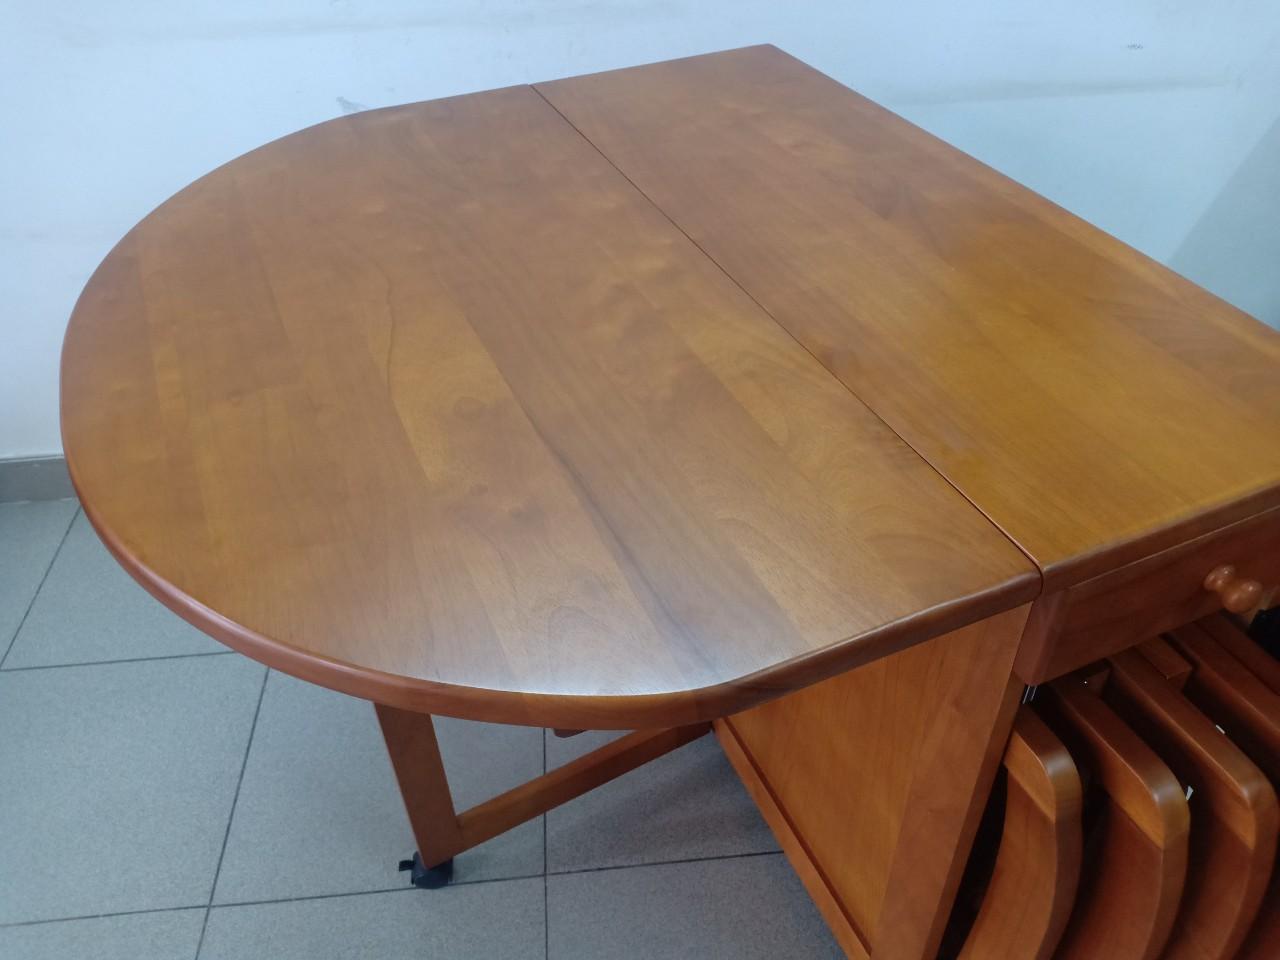 Bộ bàn ăn xếp gọn gỗ cao su xuất khẩu Hi Furniture